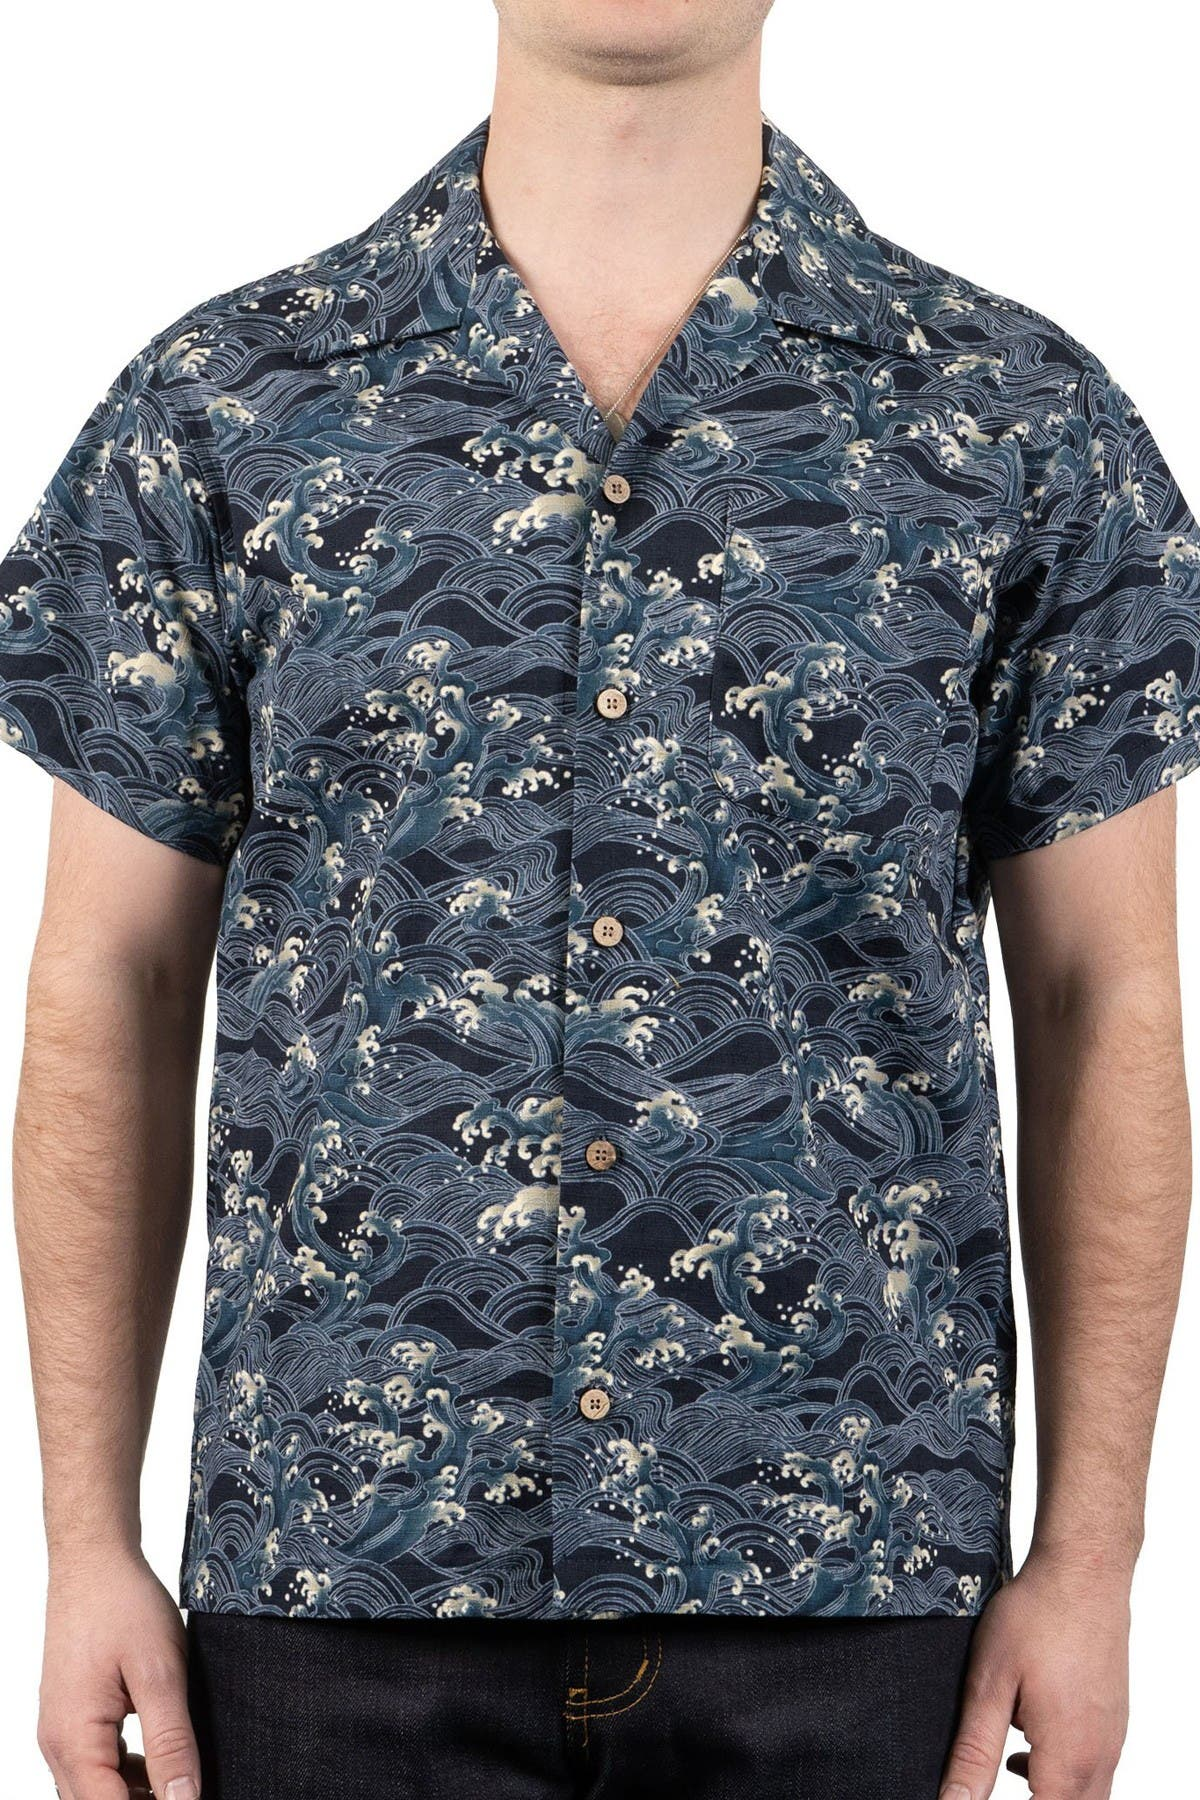 Image of Naked and Famous Aloha Shirt - Japanese Waves